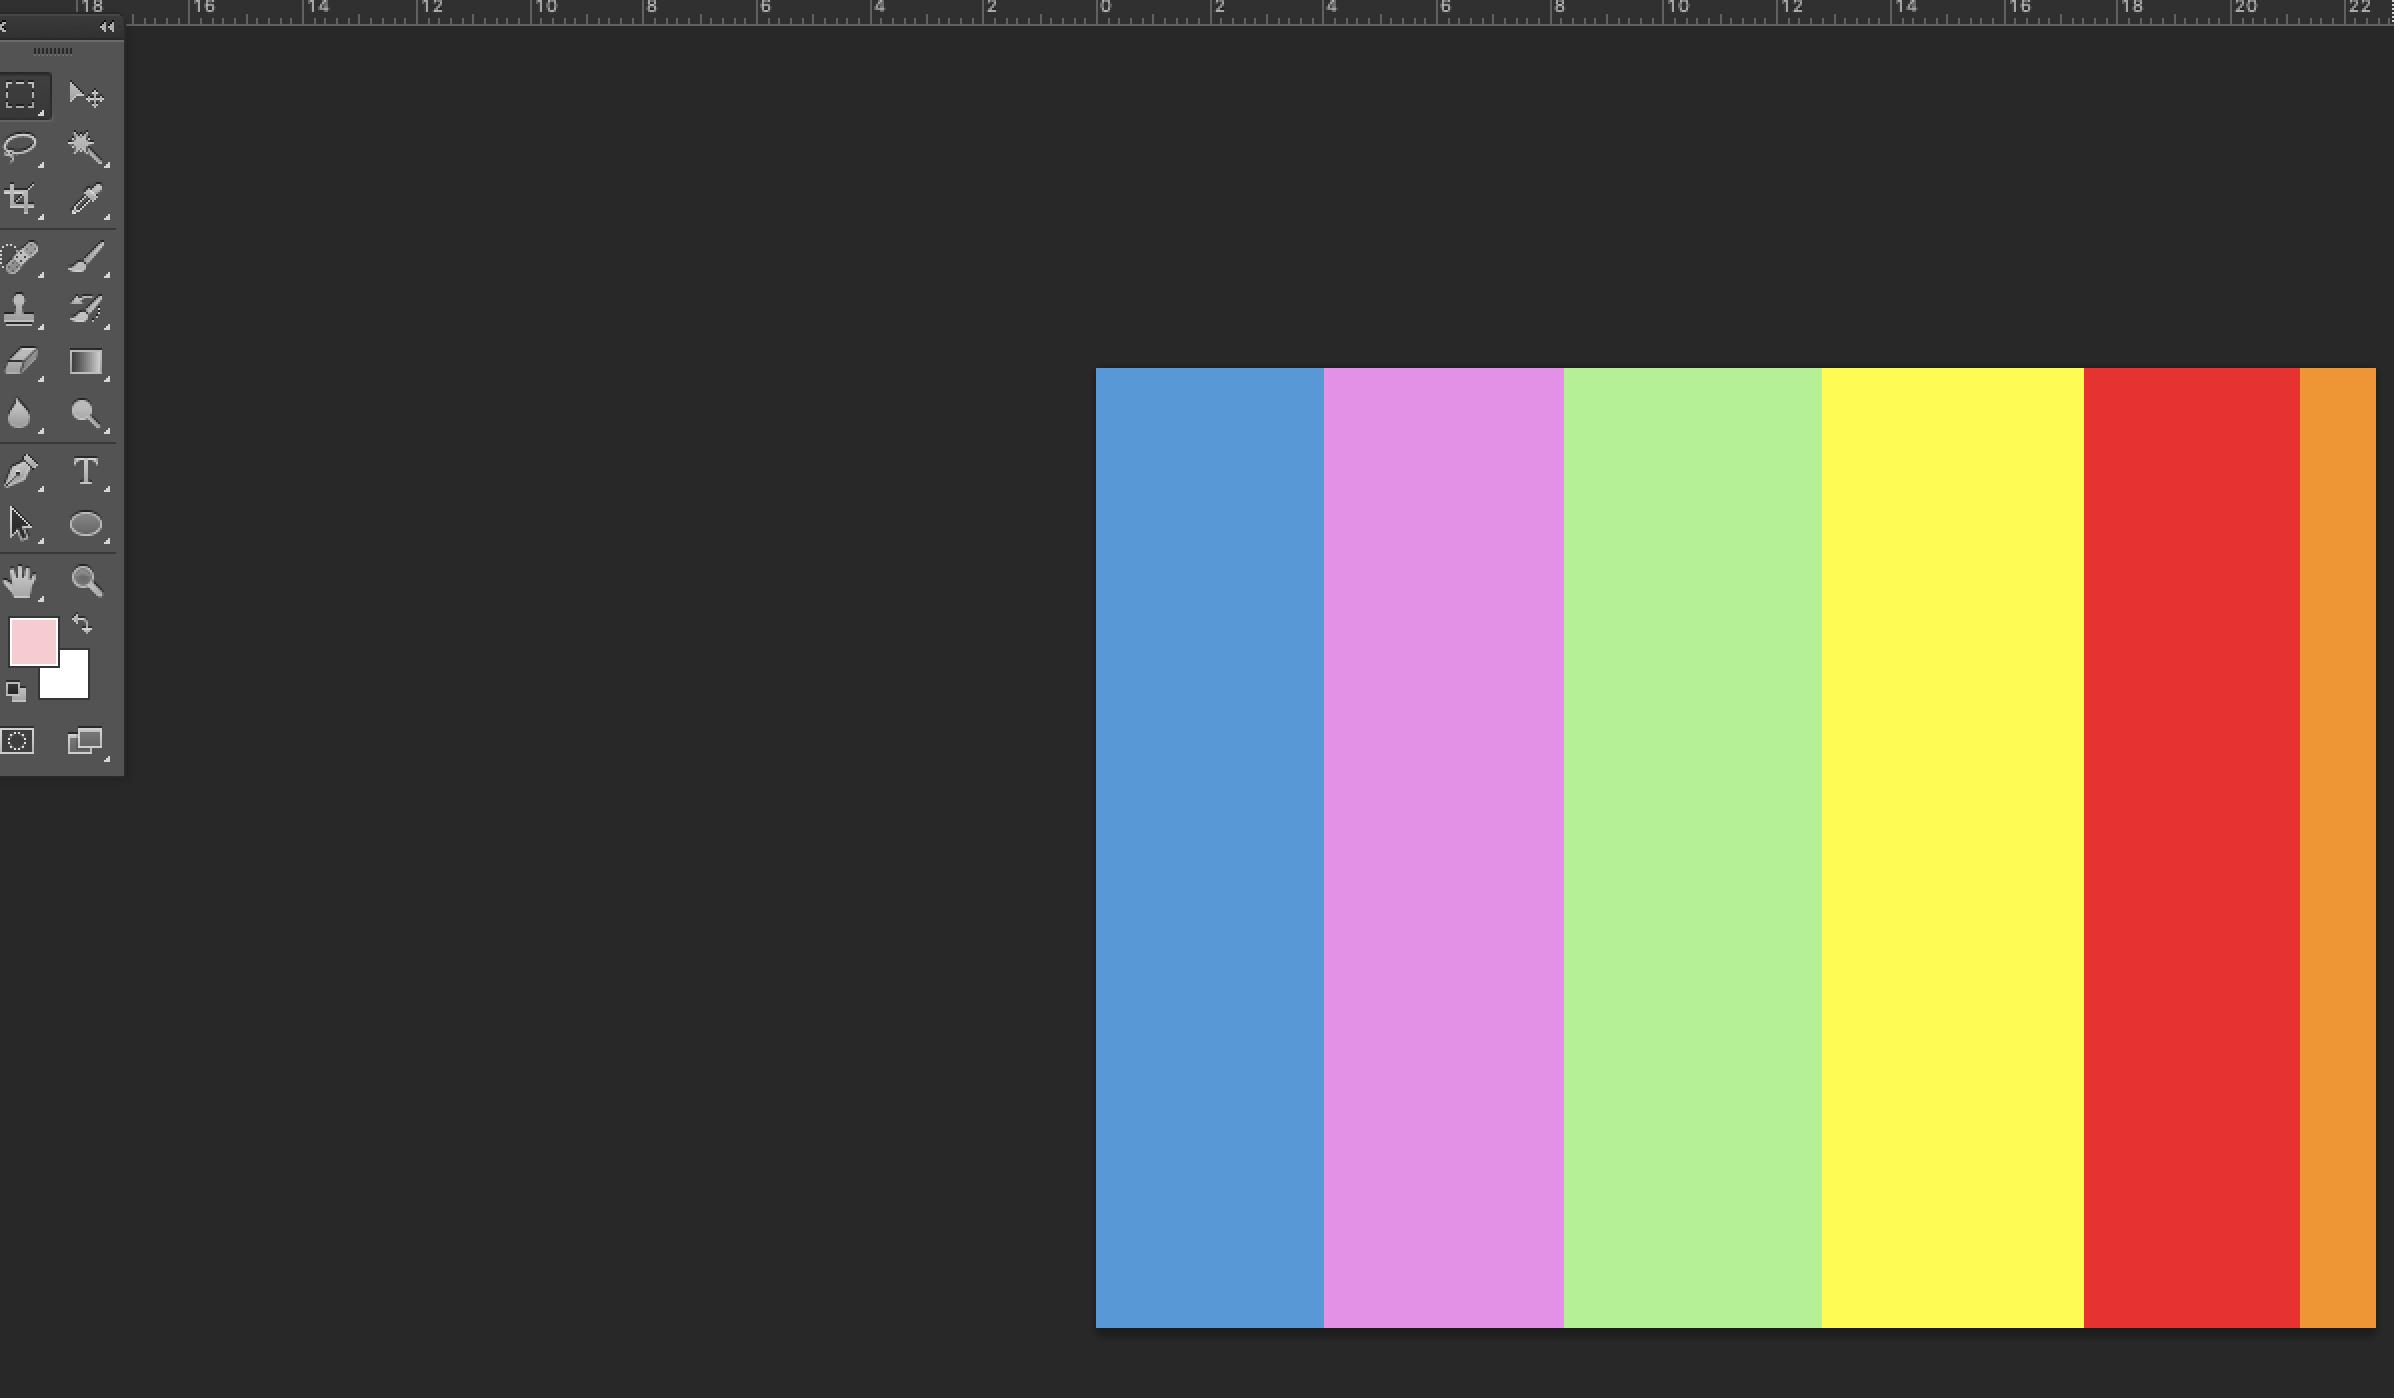 Rainbow text Adobe Photoshop